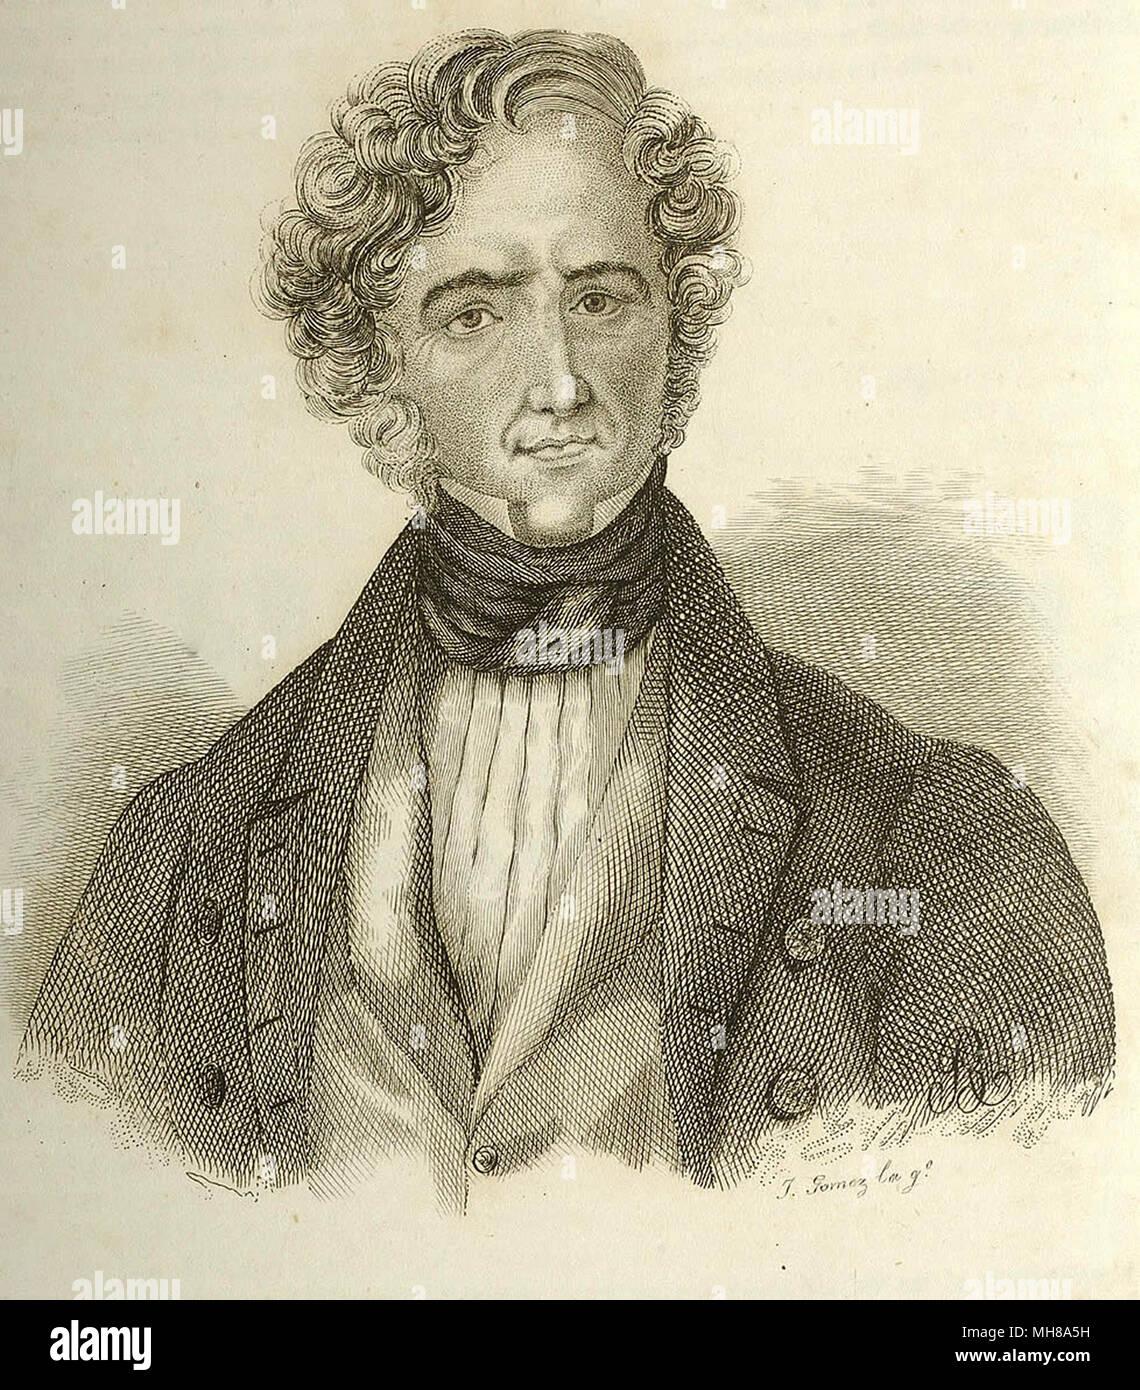 Juan Álvarez Mendizábal, born Juan Álvarez Méndez (1790 – 1853), Spanish economist and politician who served as Prime Minister of Spain from 1835 - 1836. - Stock Image